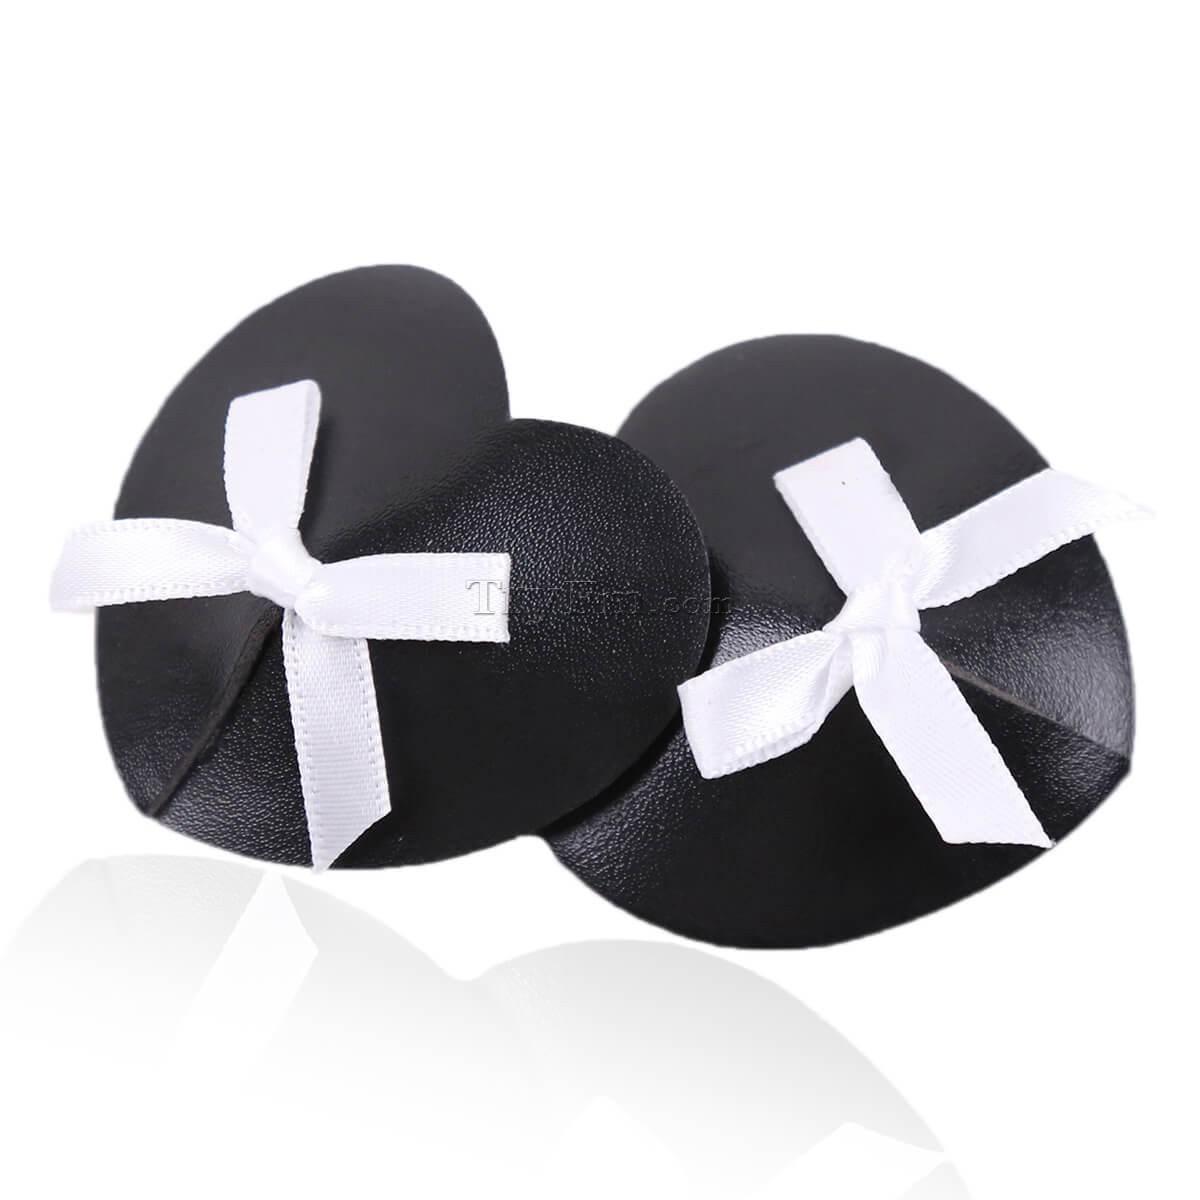 13-White-bow-knot-pasties2.jpg